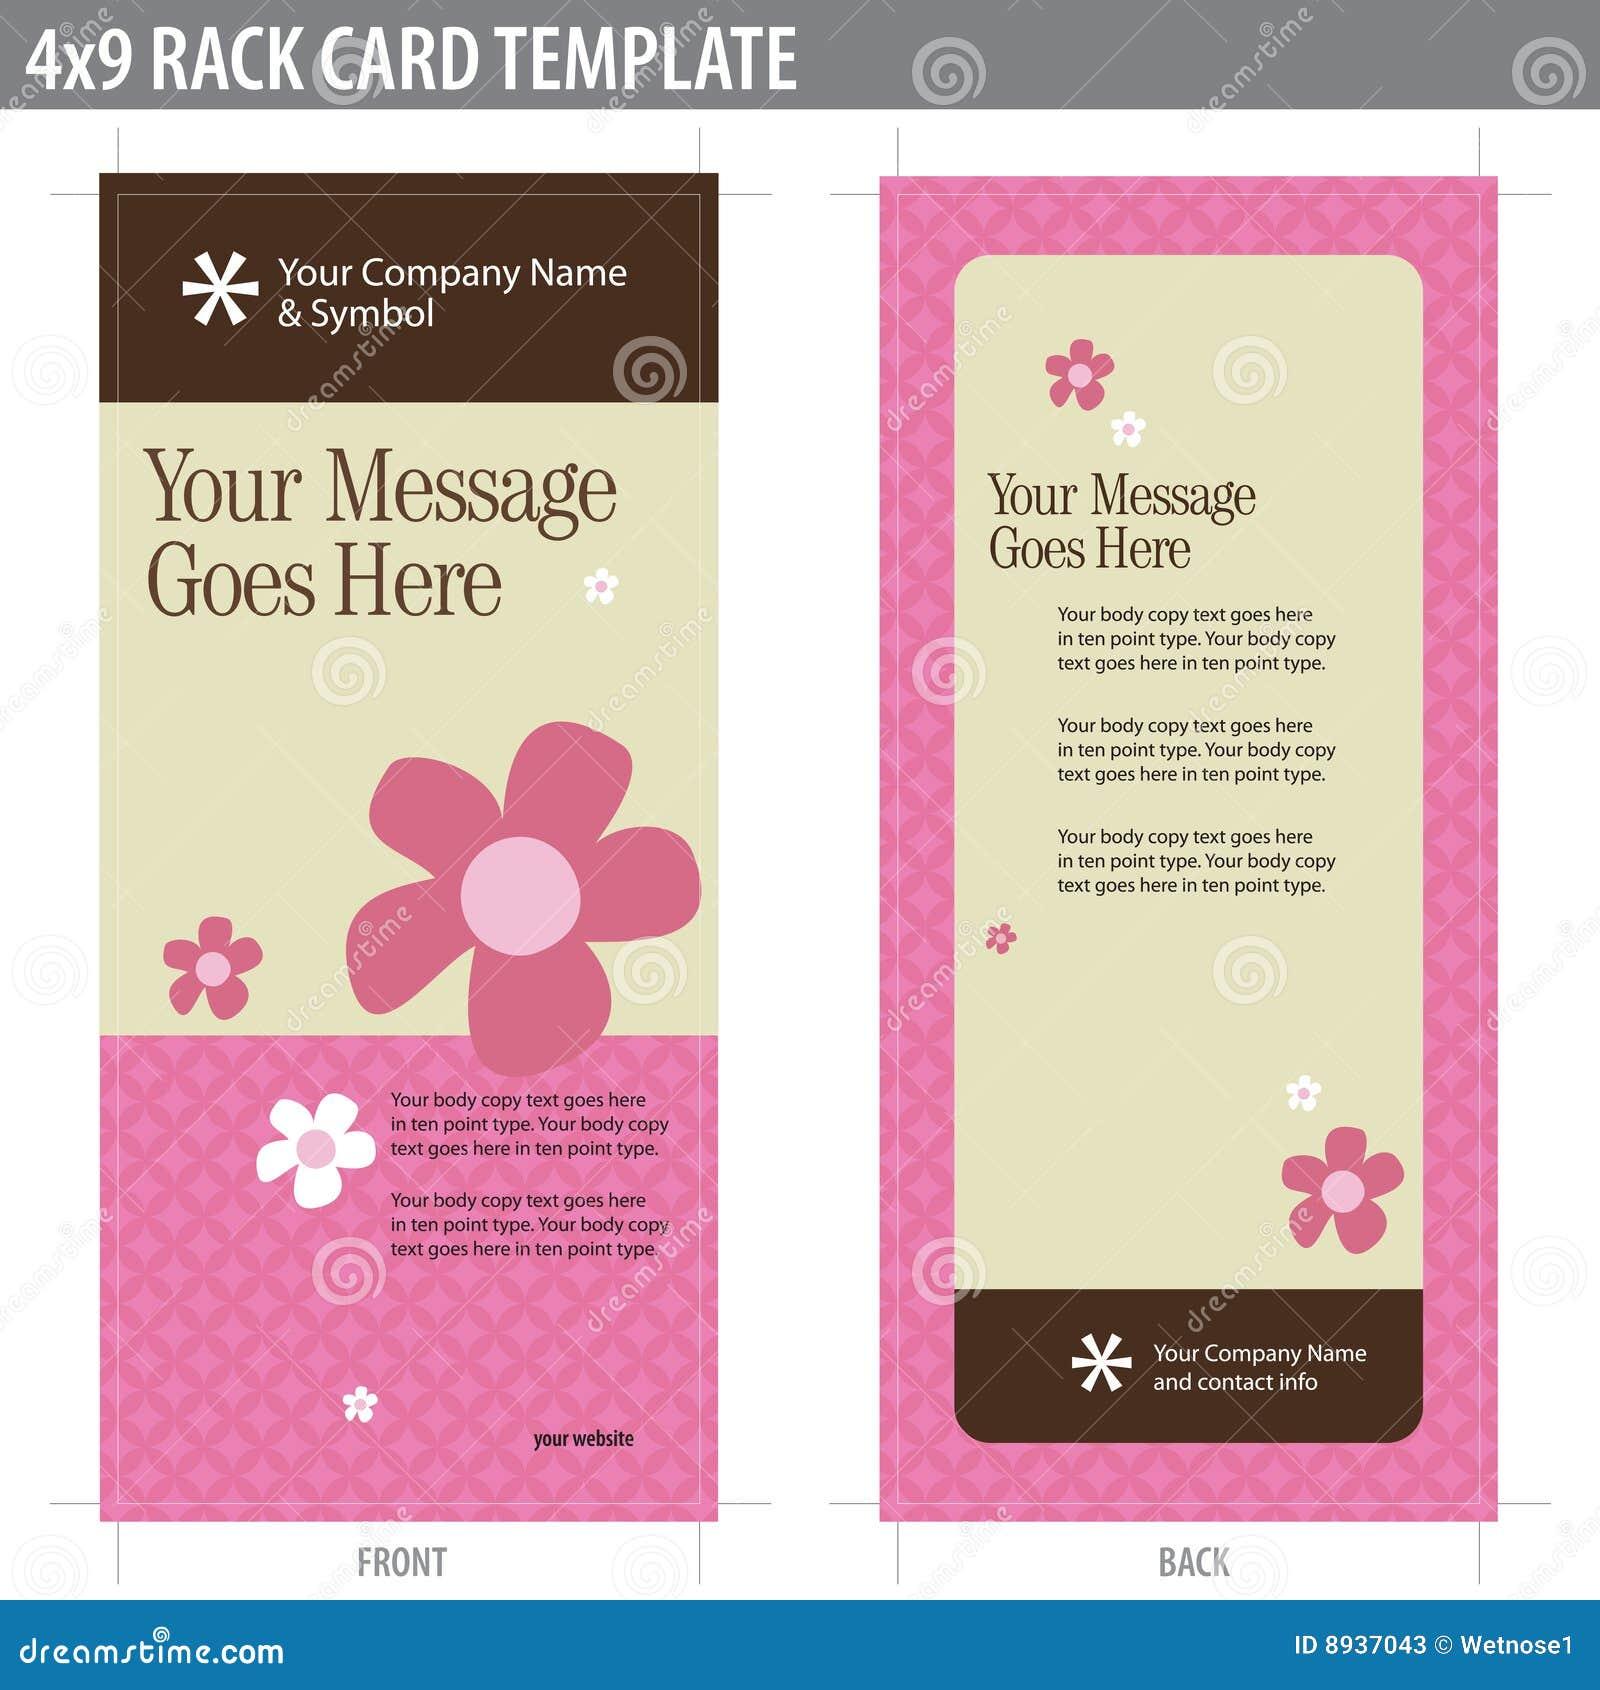 4x9 rack card brochure template stock photos image 8937043. Black Bedroom Furniture Sets. Home Design Ideas